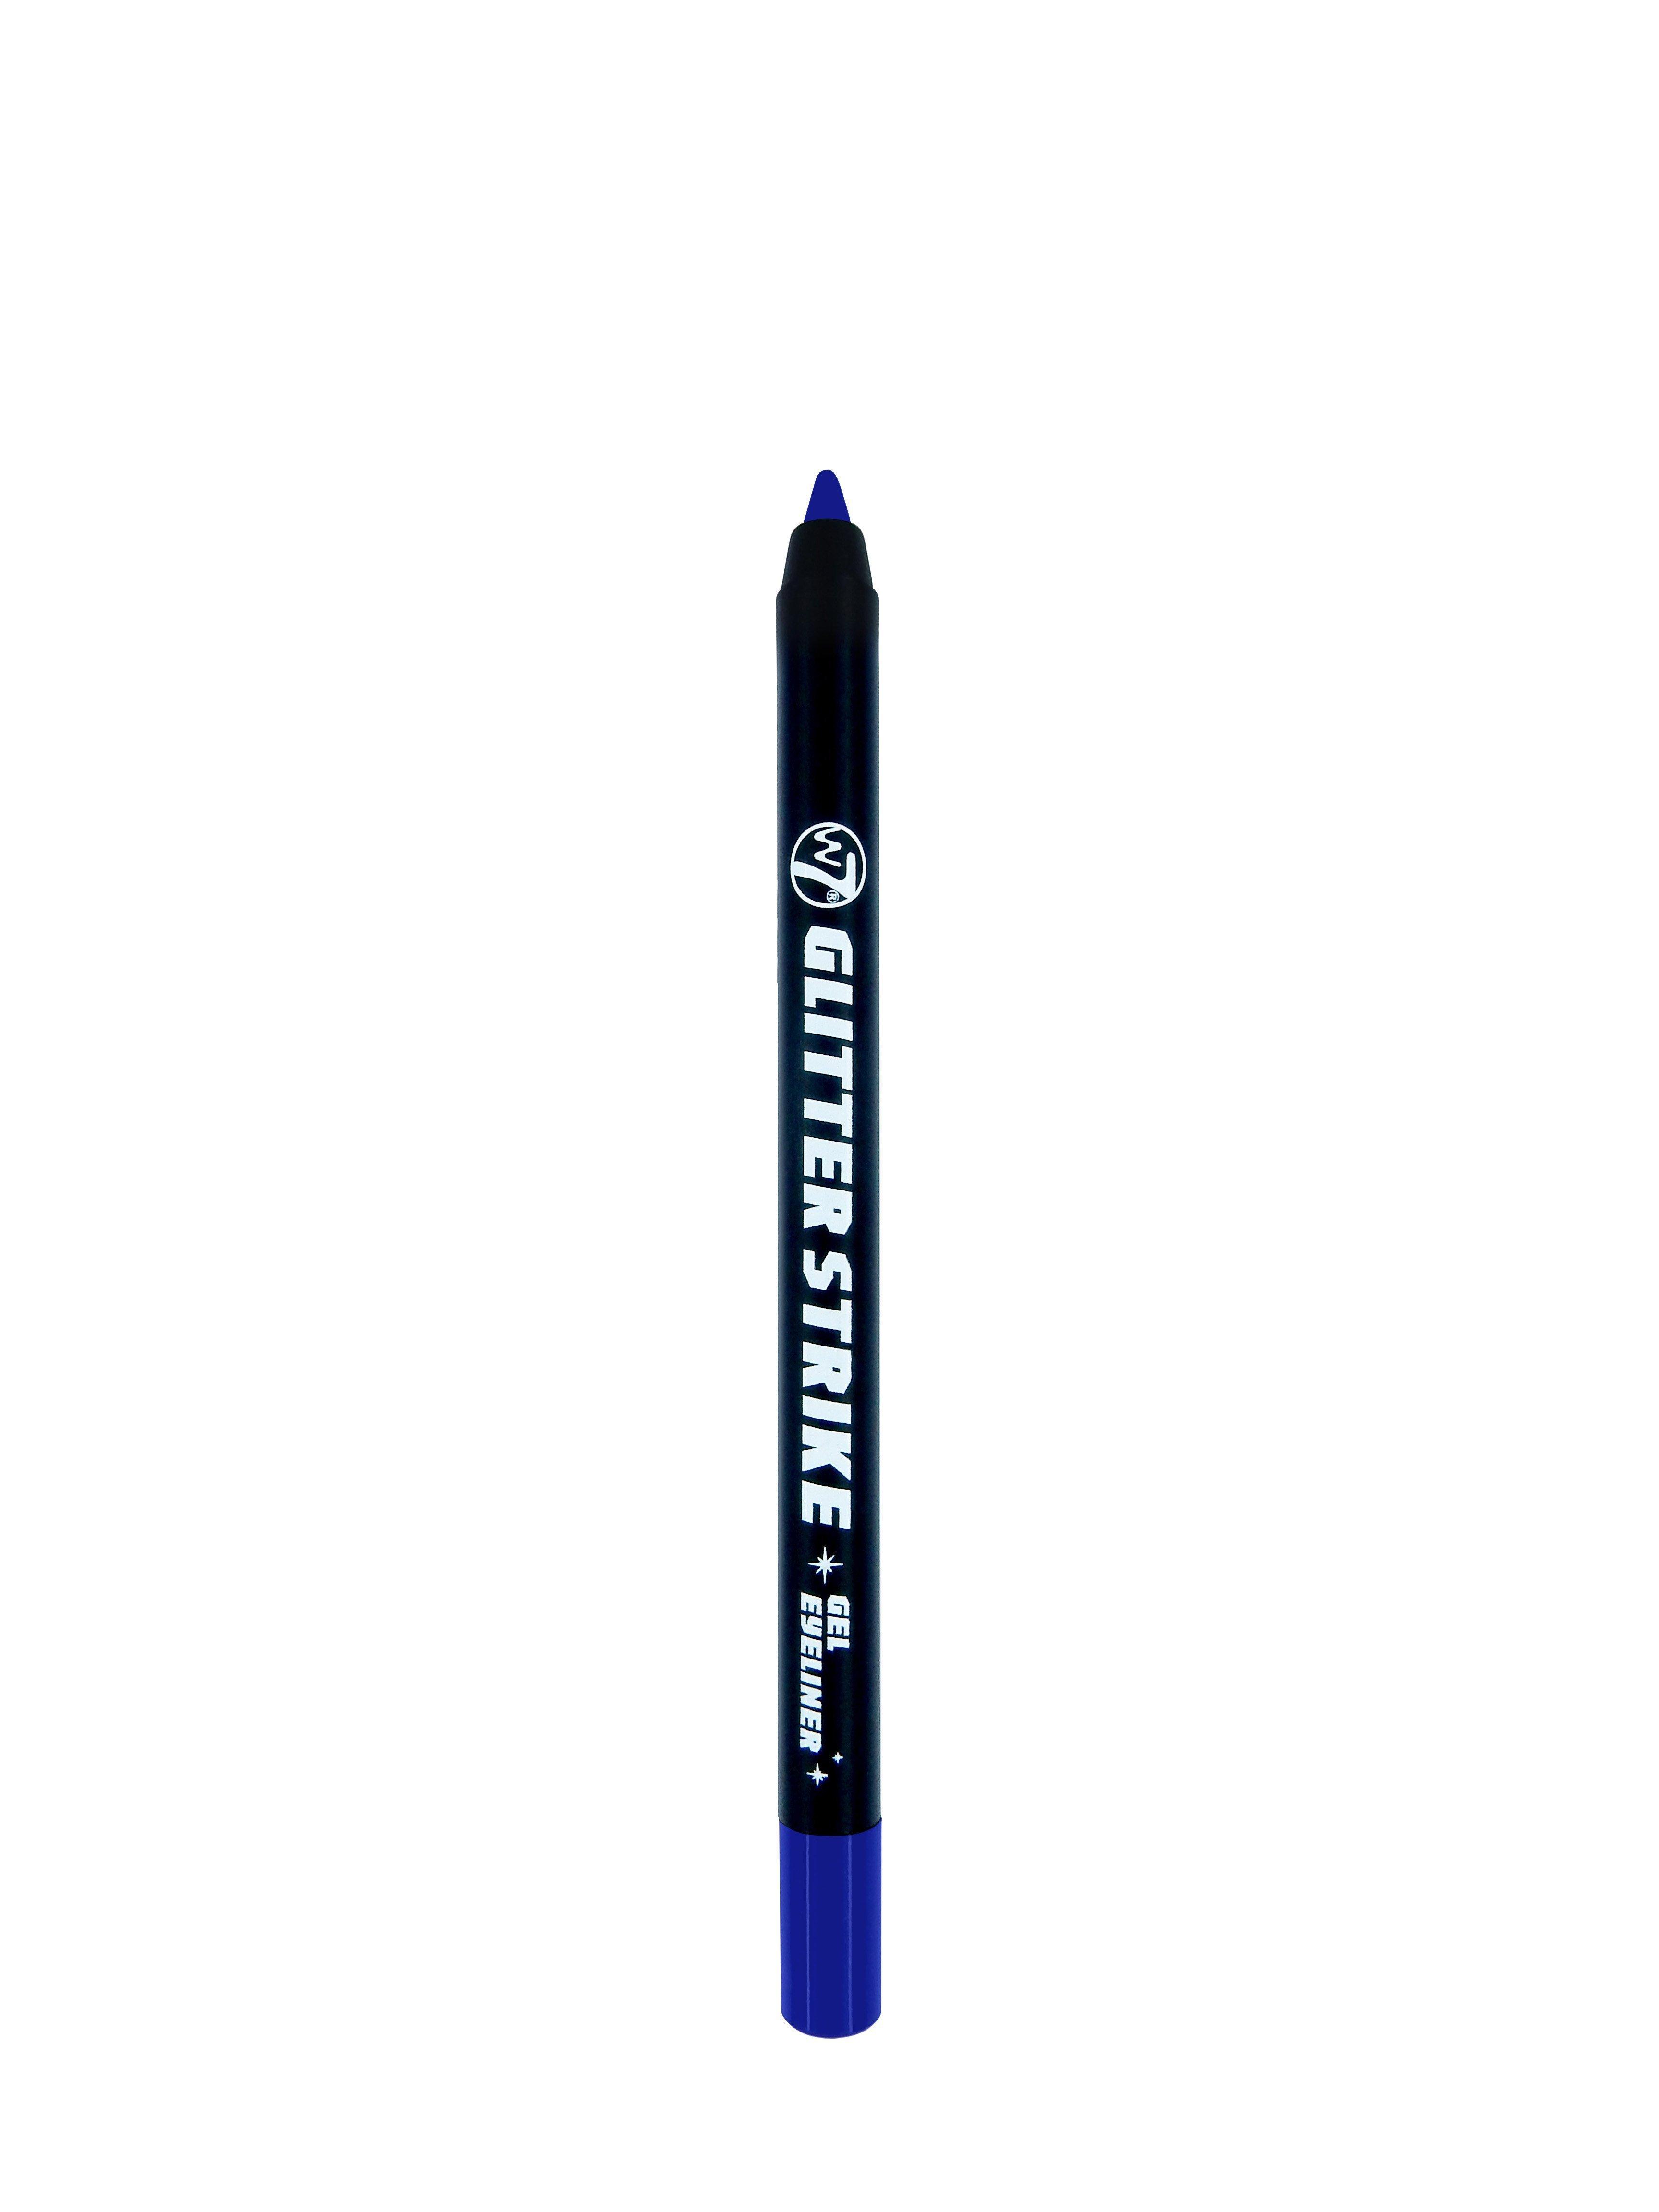 W7 Glitter Strike - Banging Blue